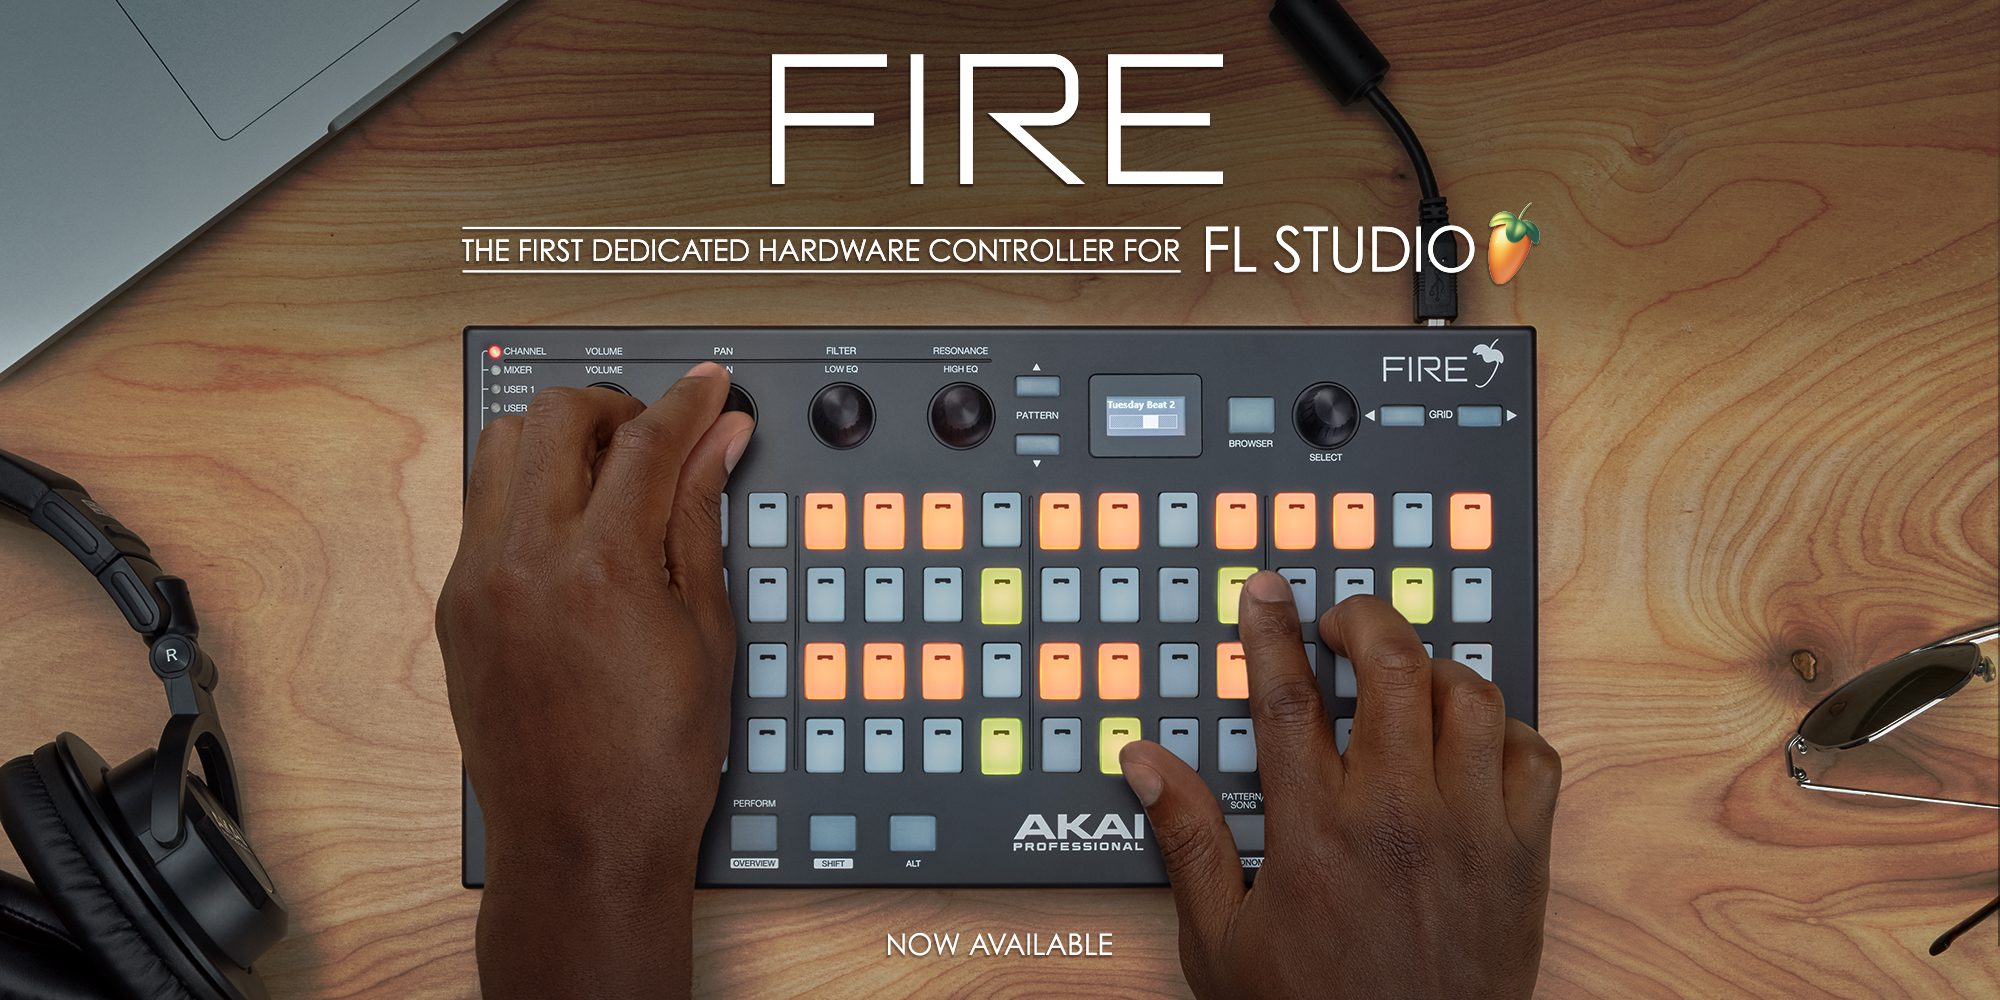 Top News: AKAI Fire FL Studio, USB-Controller - AMAZONA de